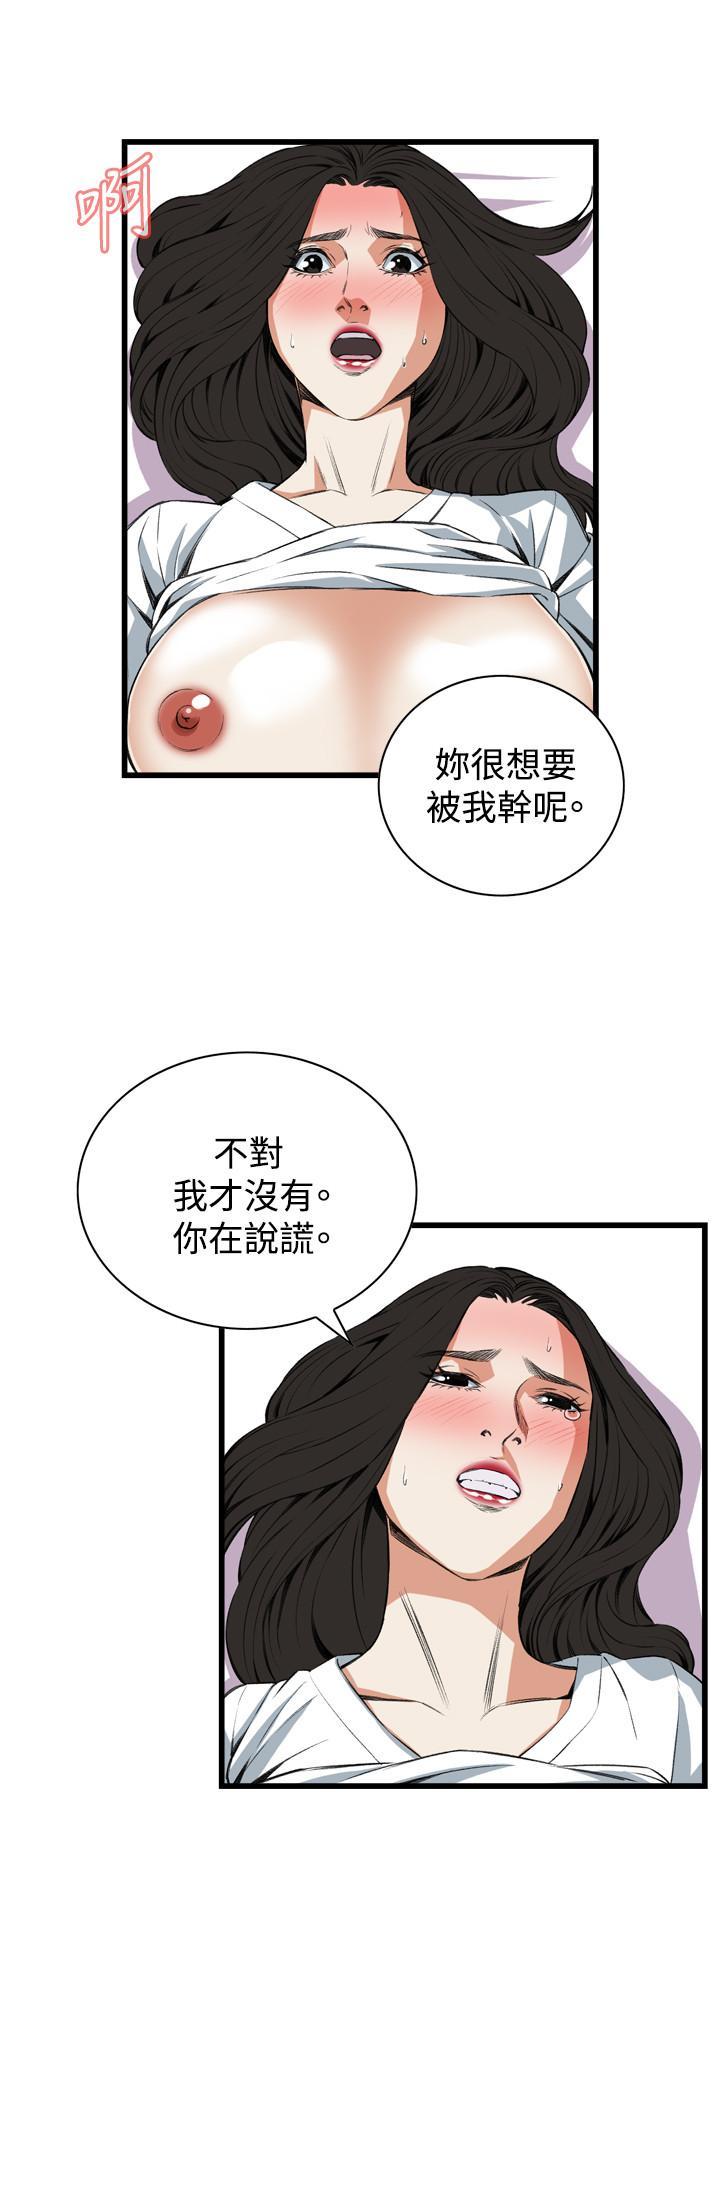 Take a Peek 偷窥 Ch.39~60 [Chinese]中文 674